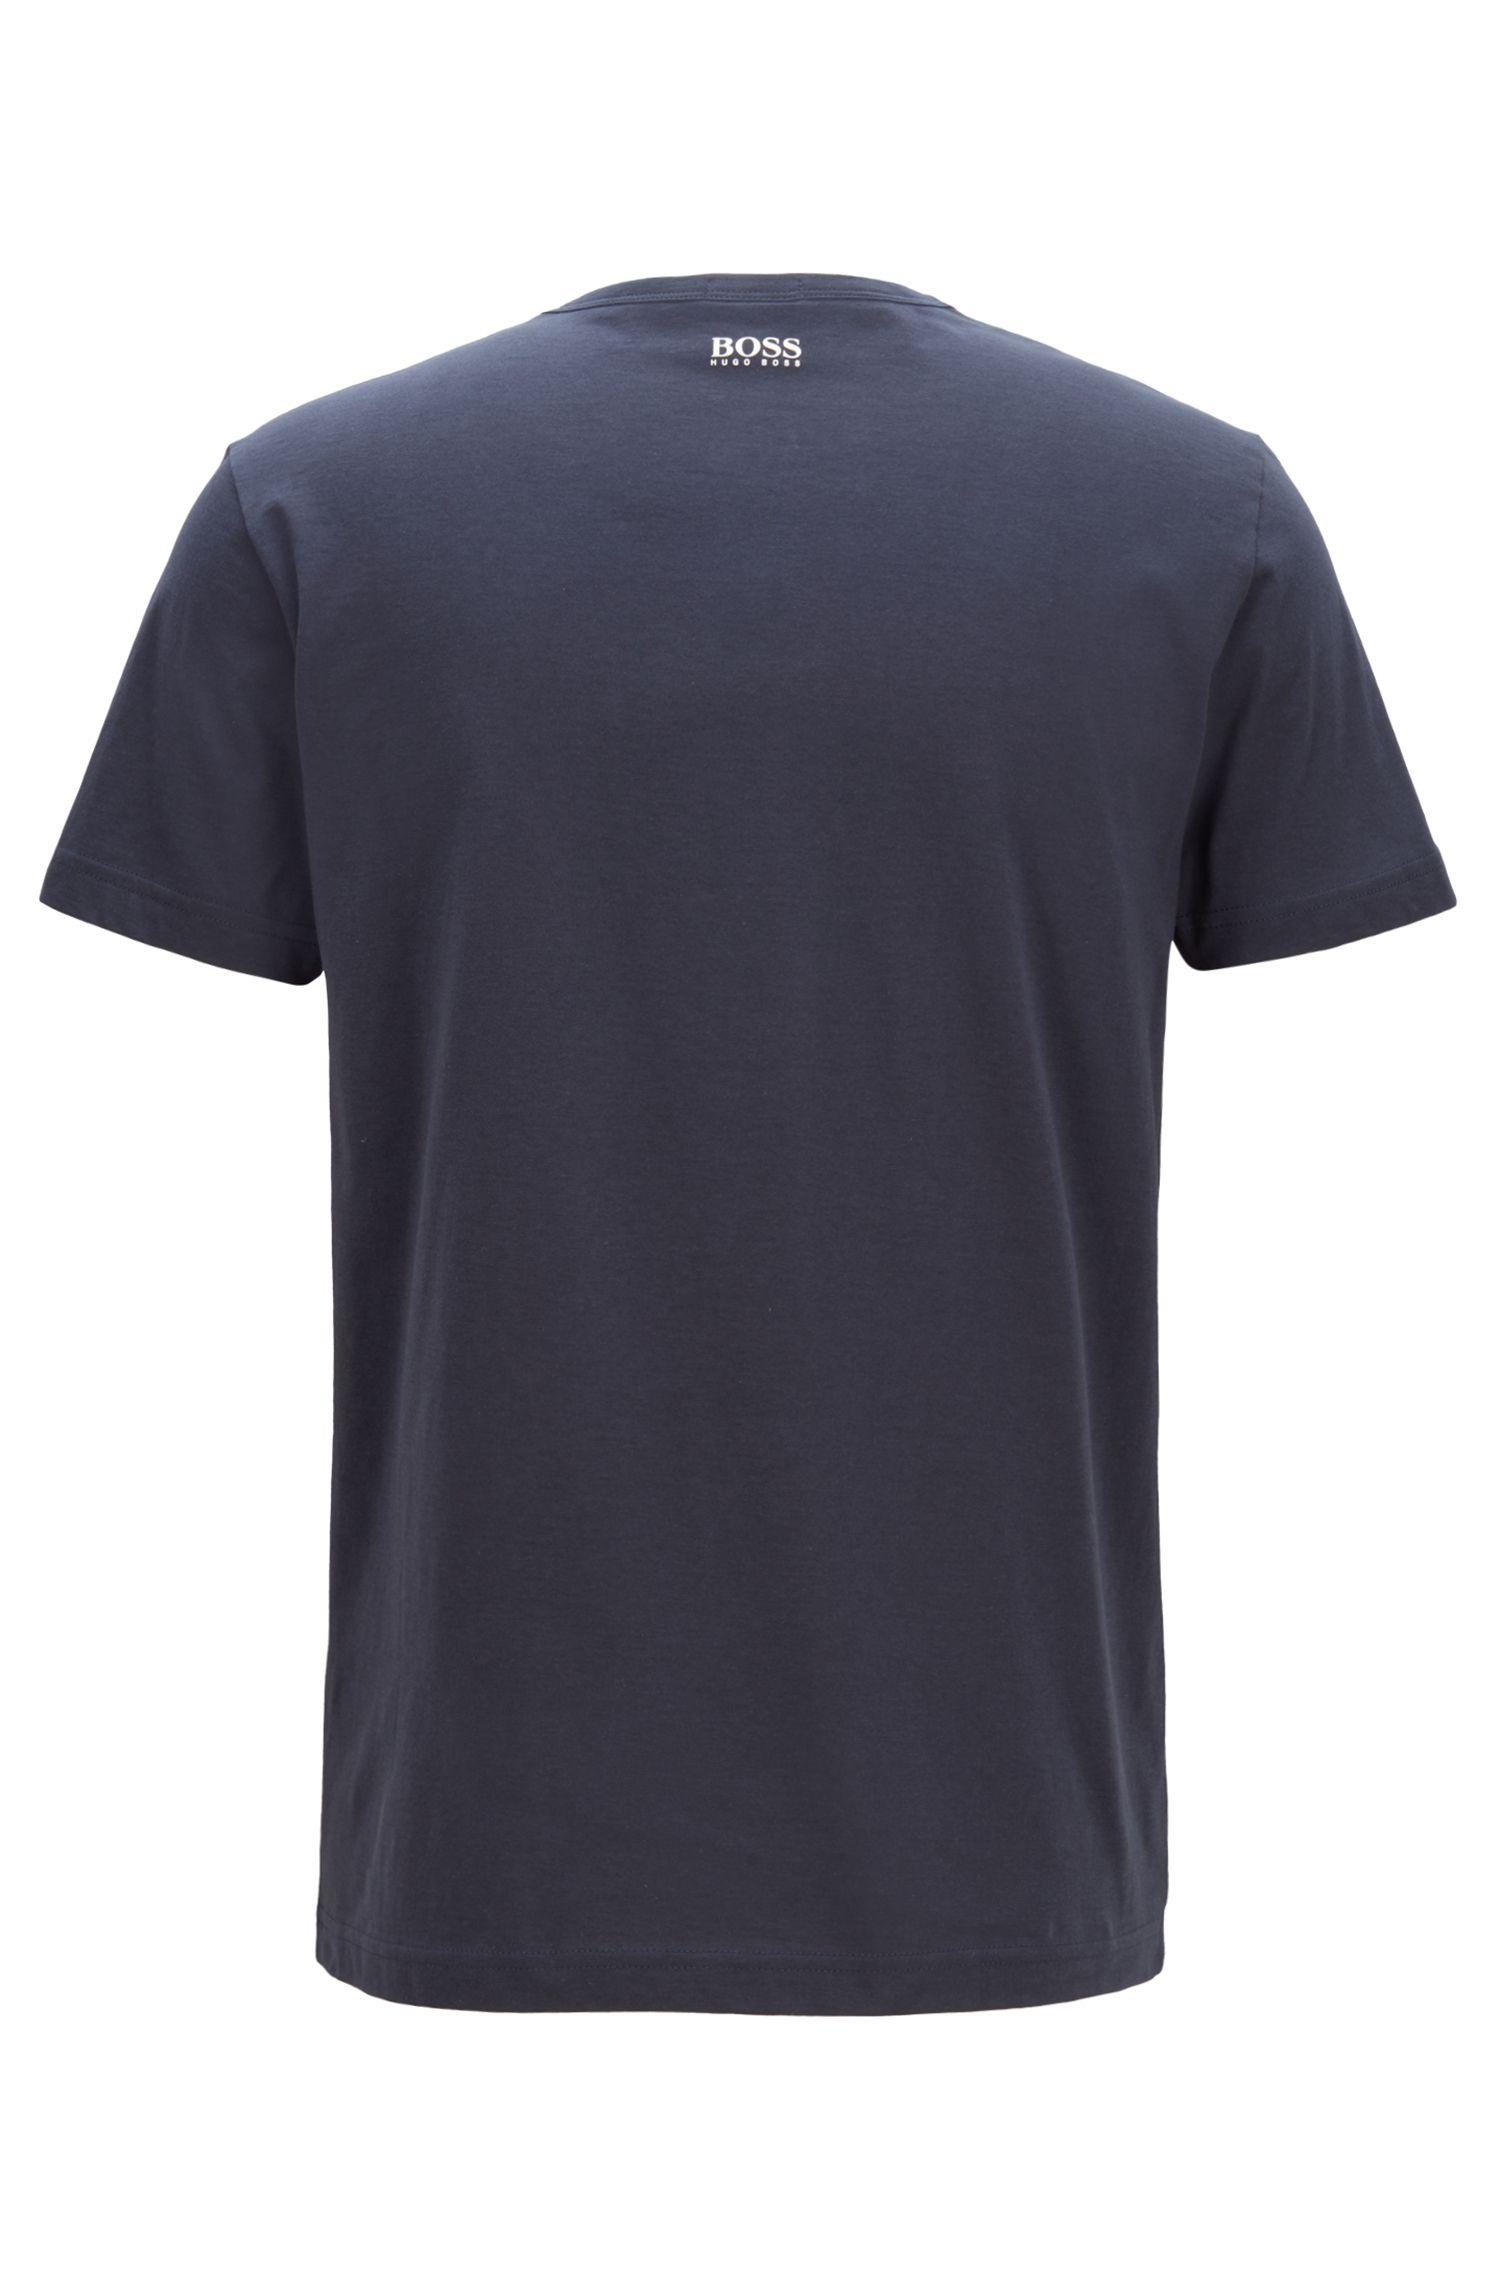 Crew-neck T-shirt in cotton with multicoloured graphic print, Dark Blue